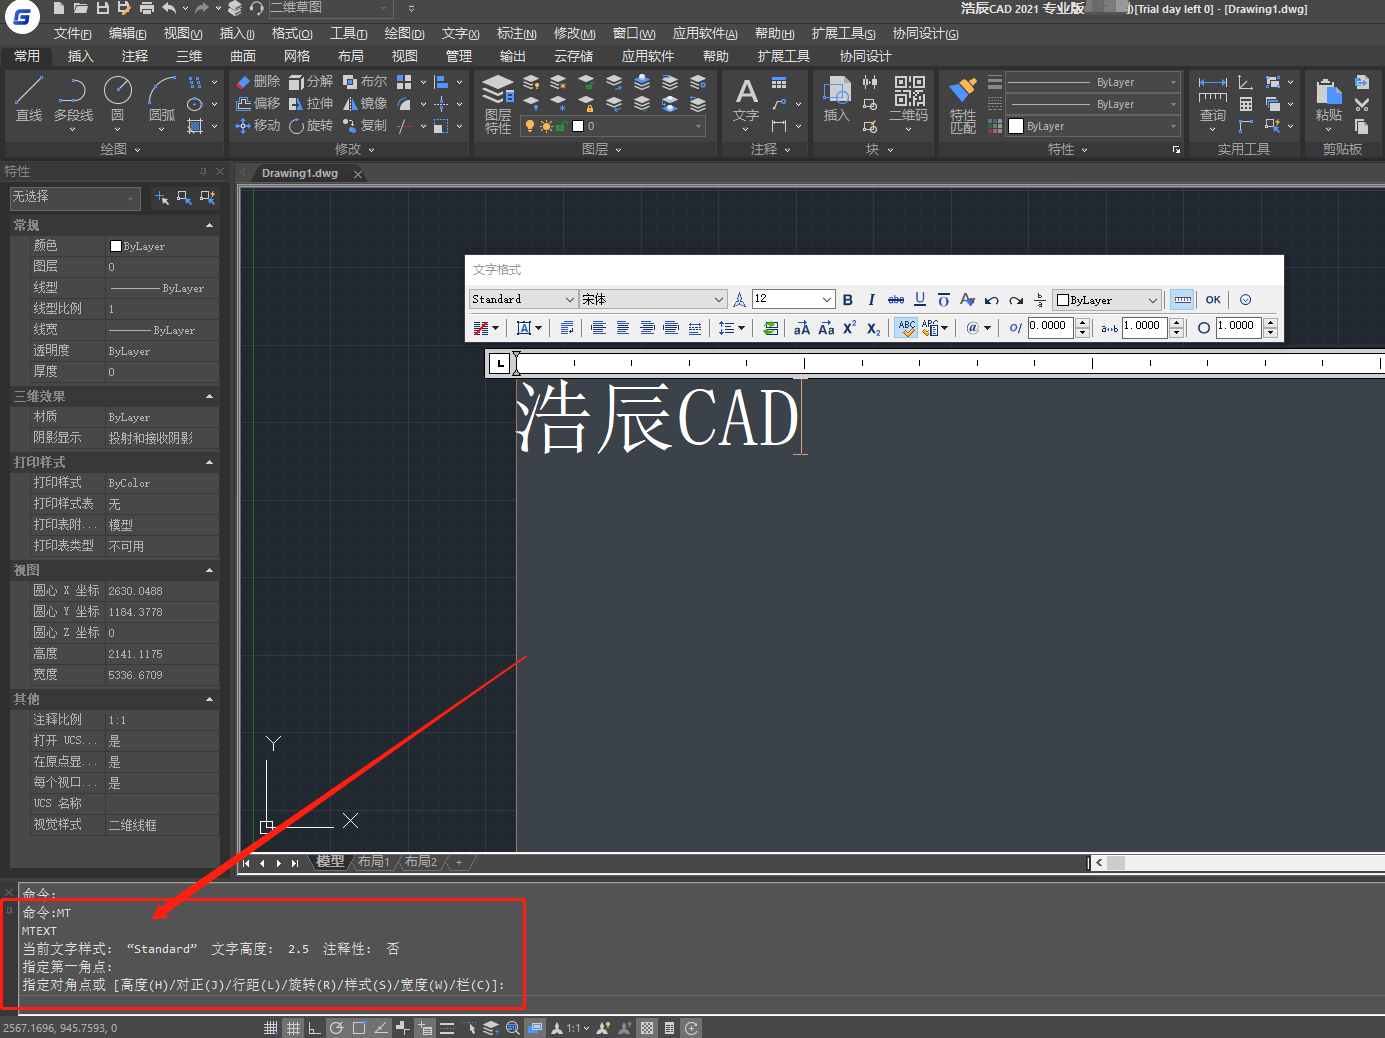 CAD多行文字快捷键是什么?怎么用?